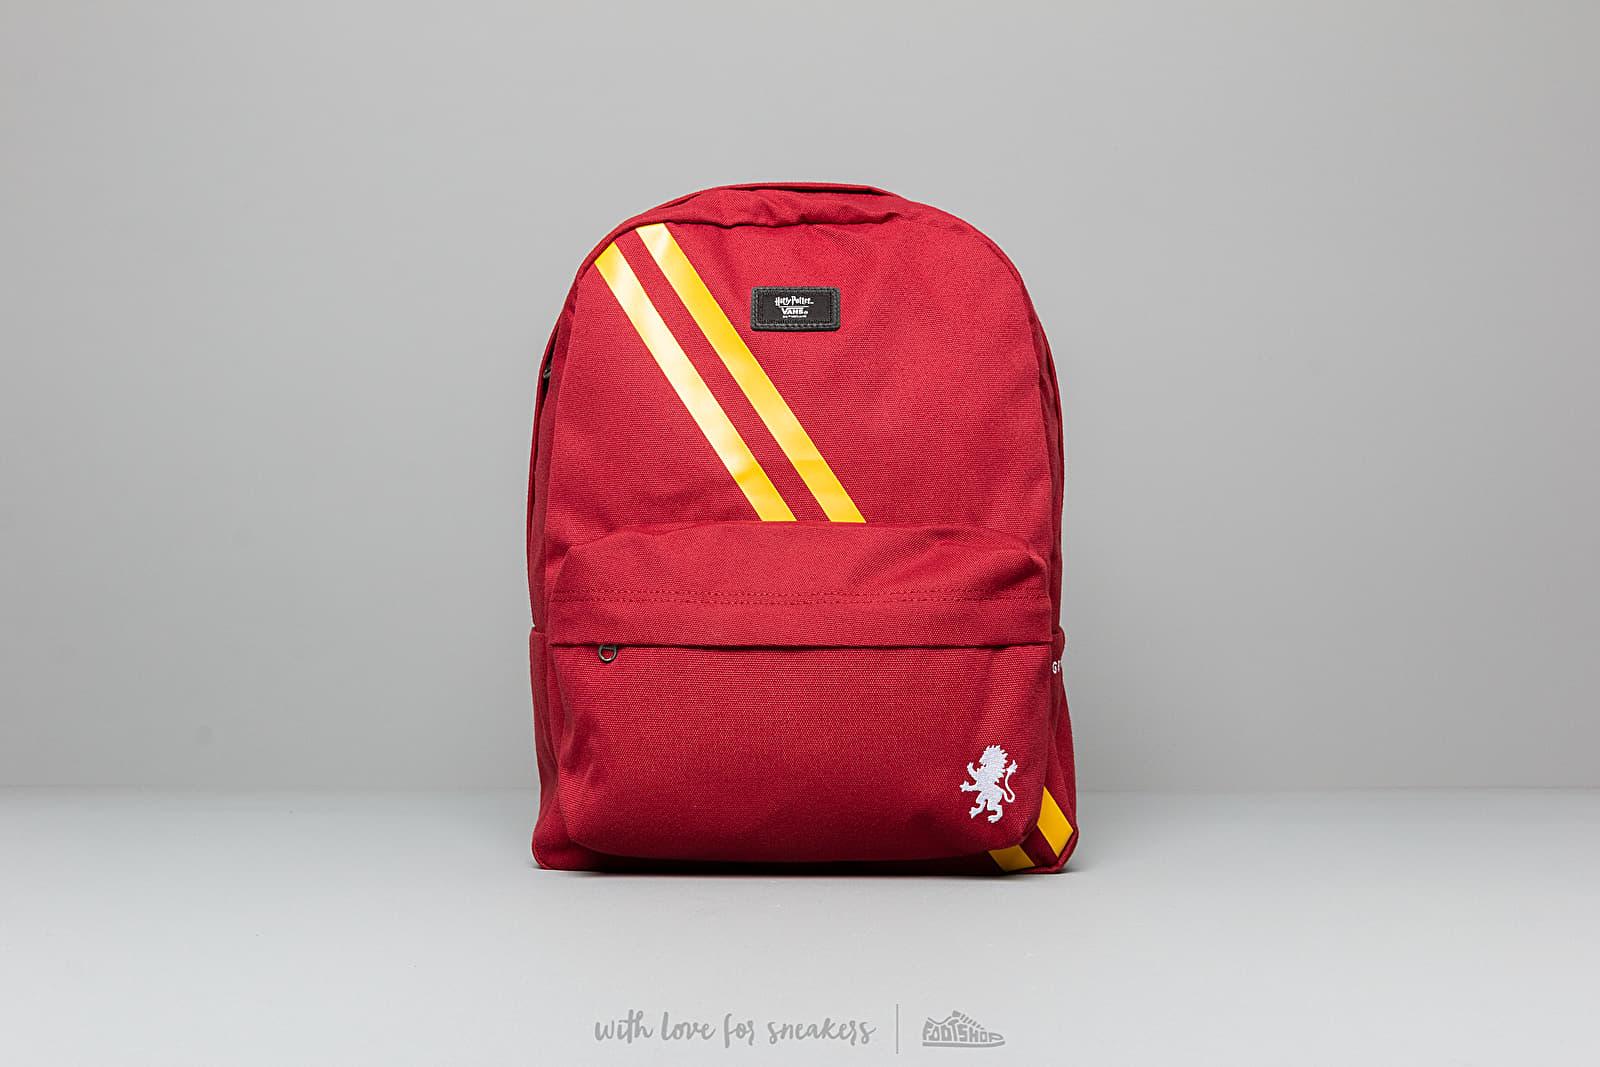 Vans x Harry Potter Old Skoll III Gryffindor Backpack